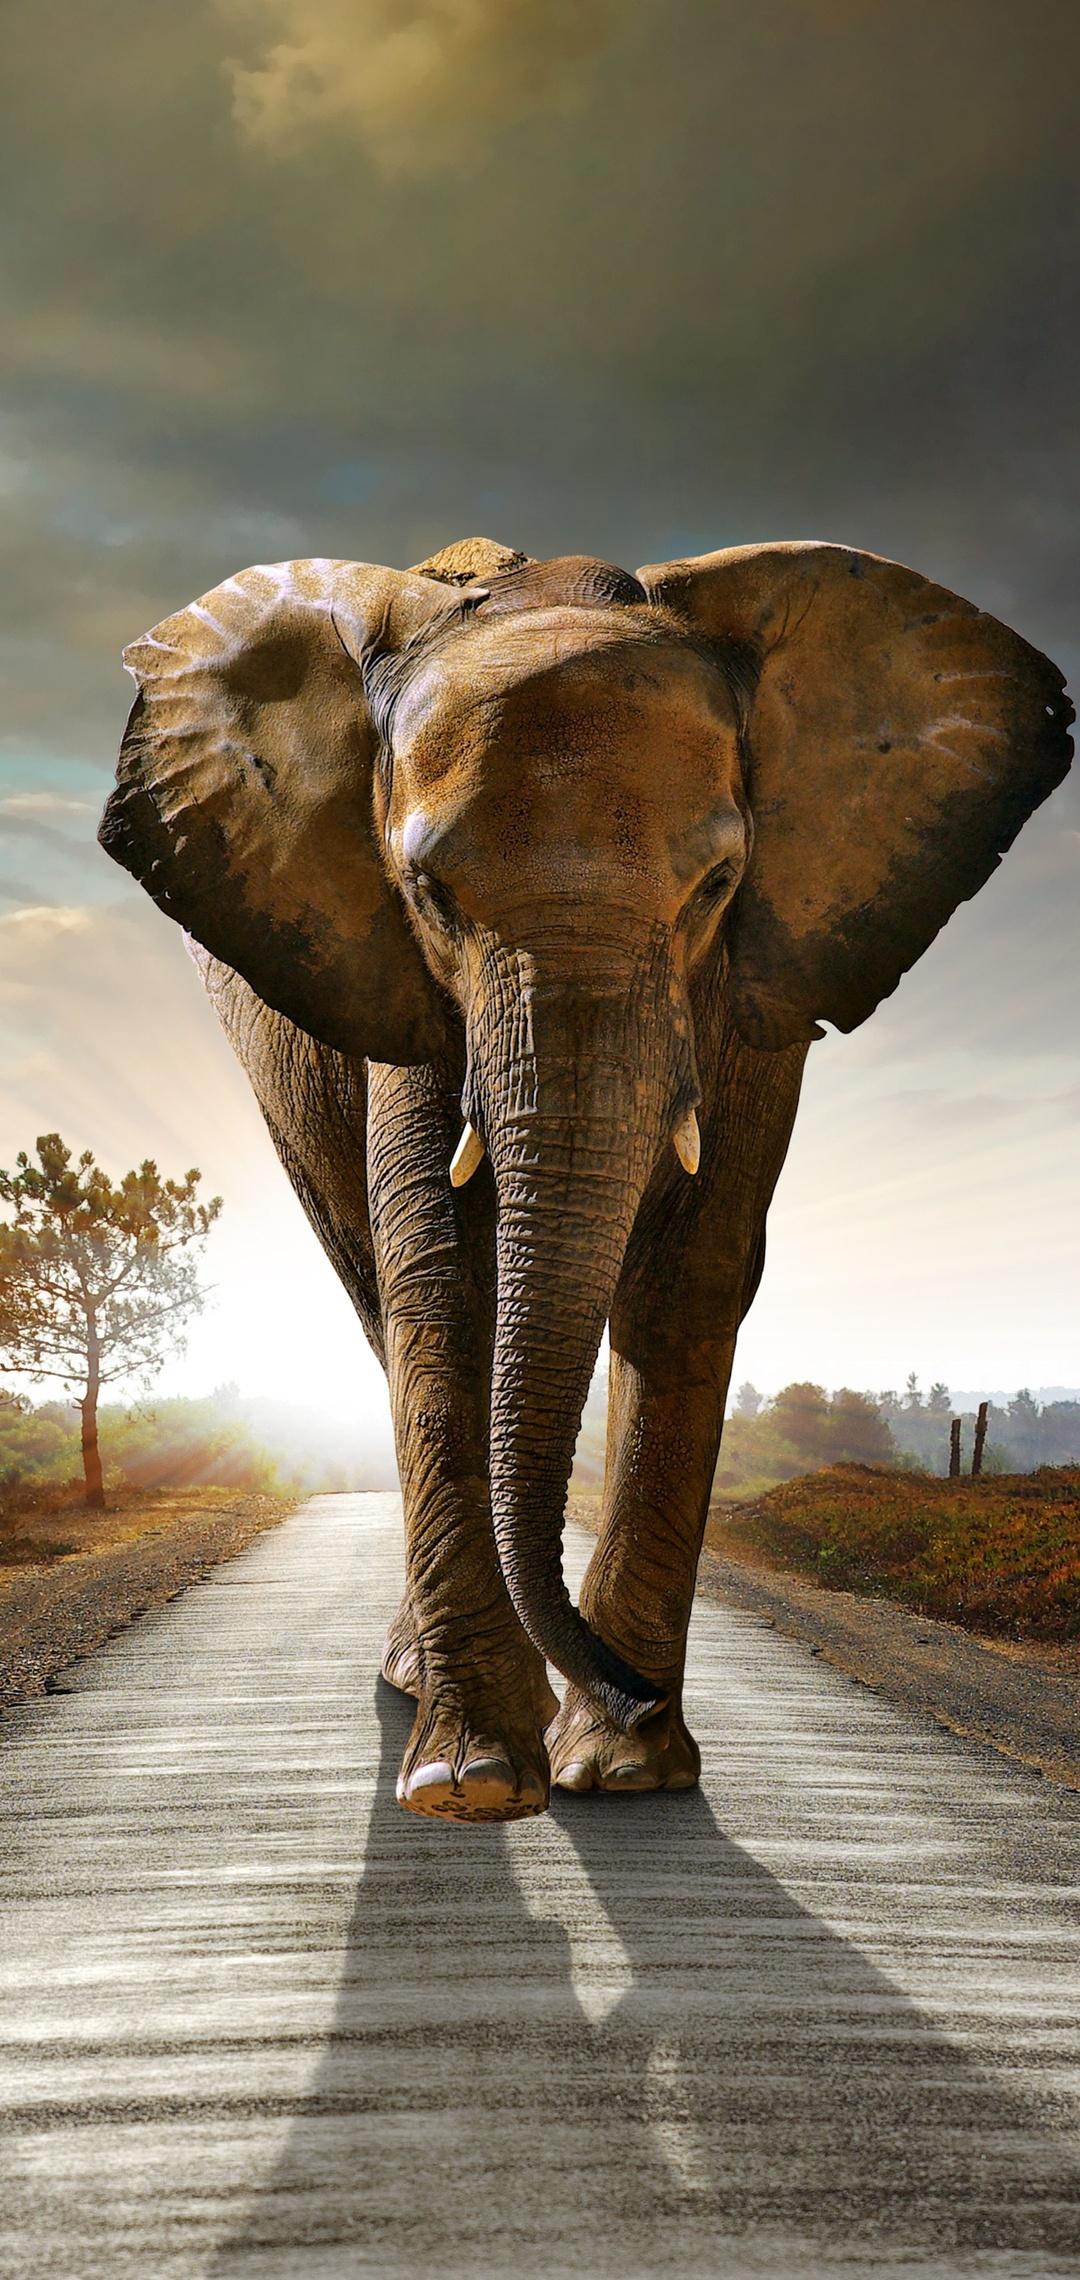 elephant-walking-on-the-road-hdr-8k-z1.jpg